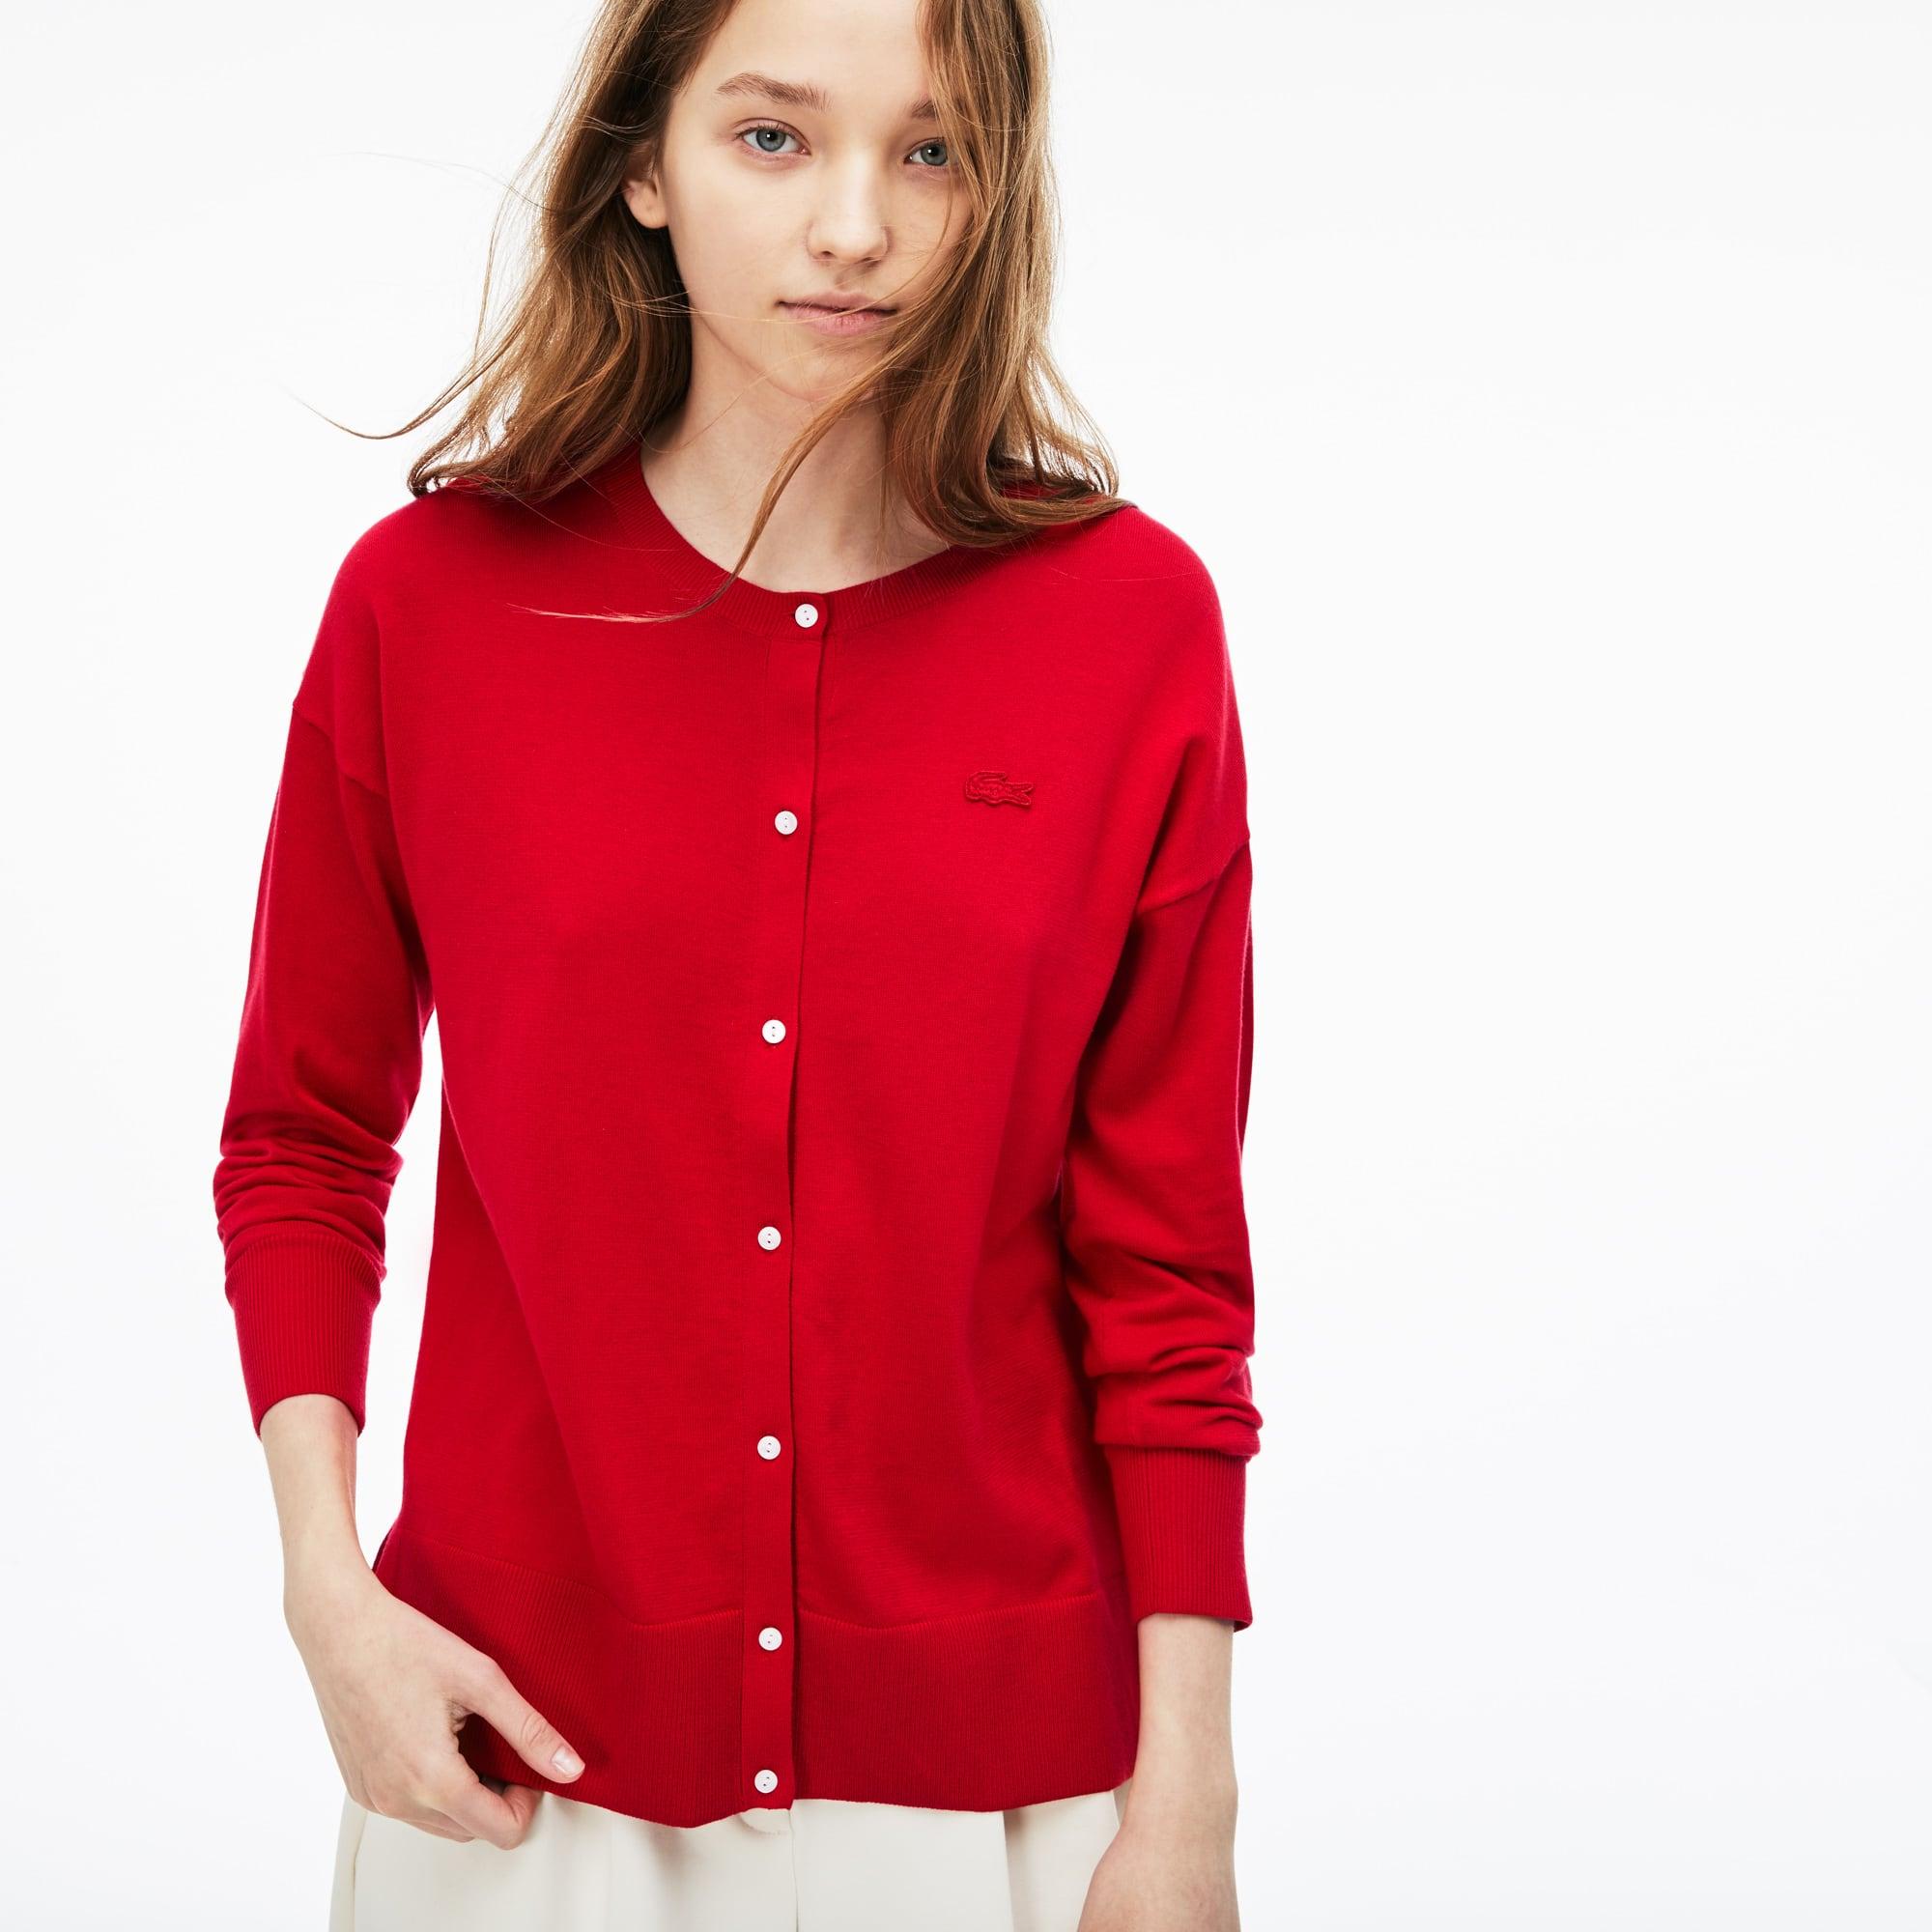 Cardigan a girocollo in jersey di cotone tinta unita